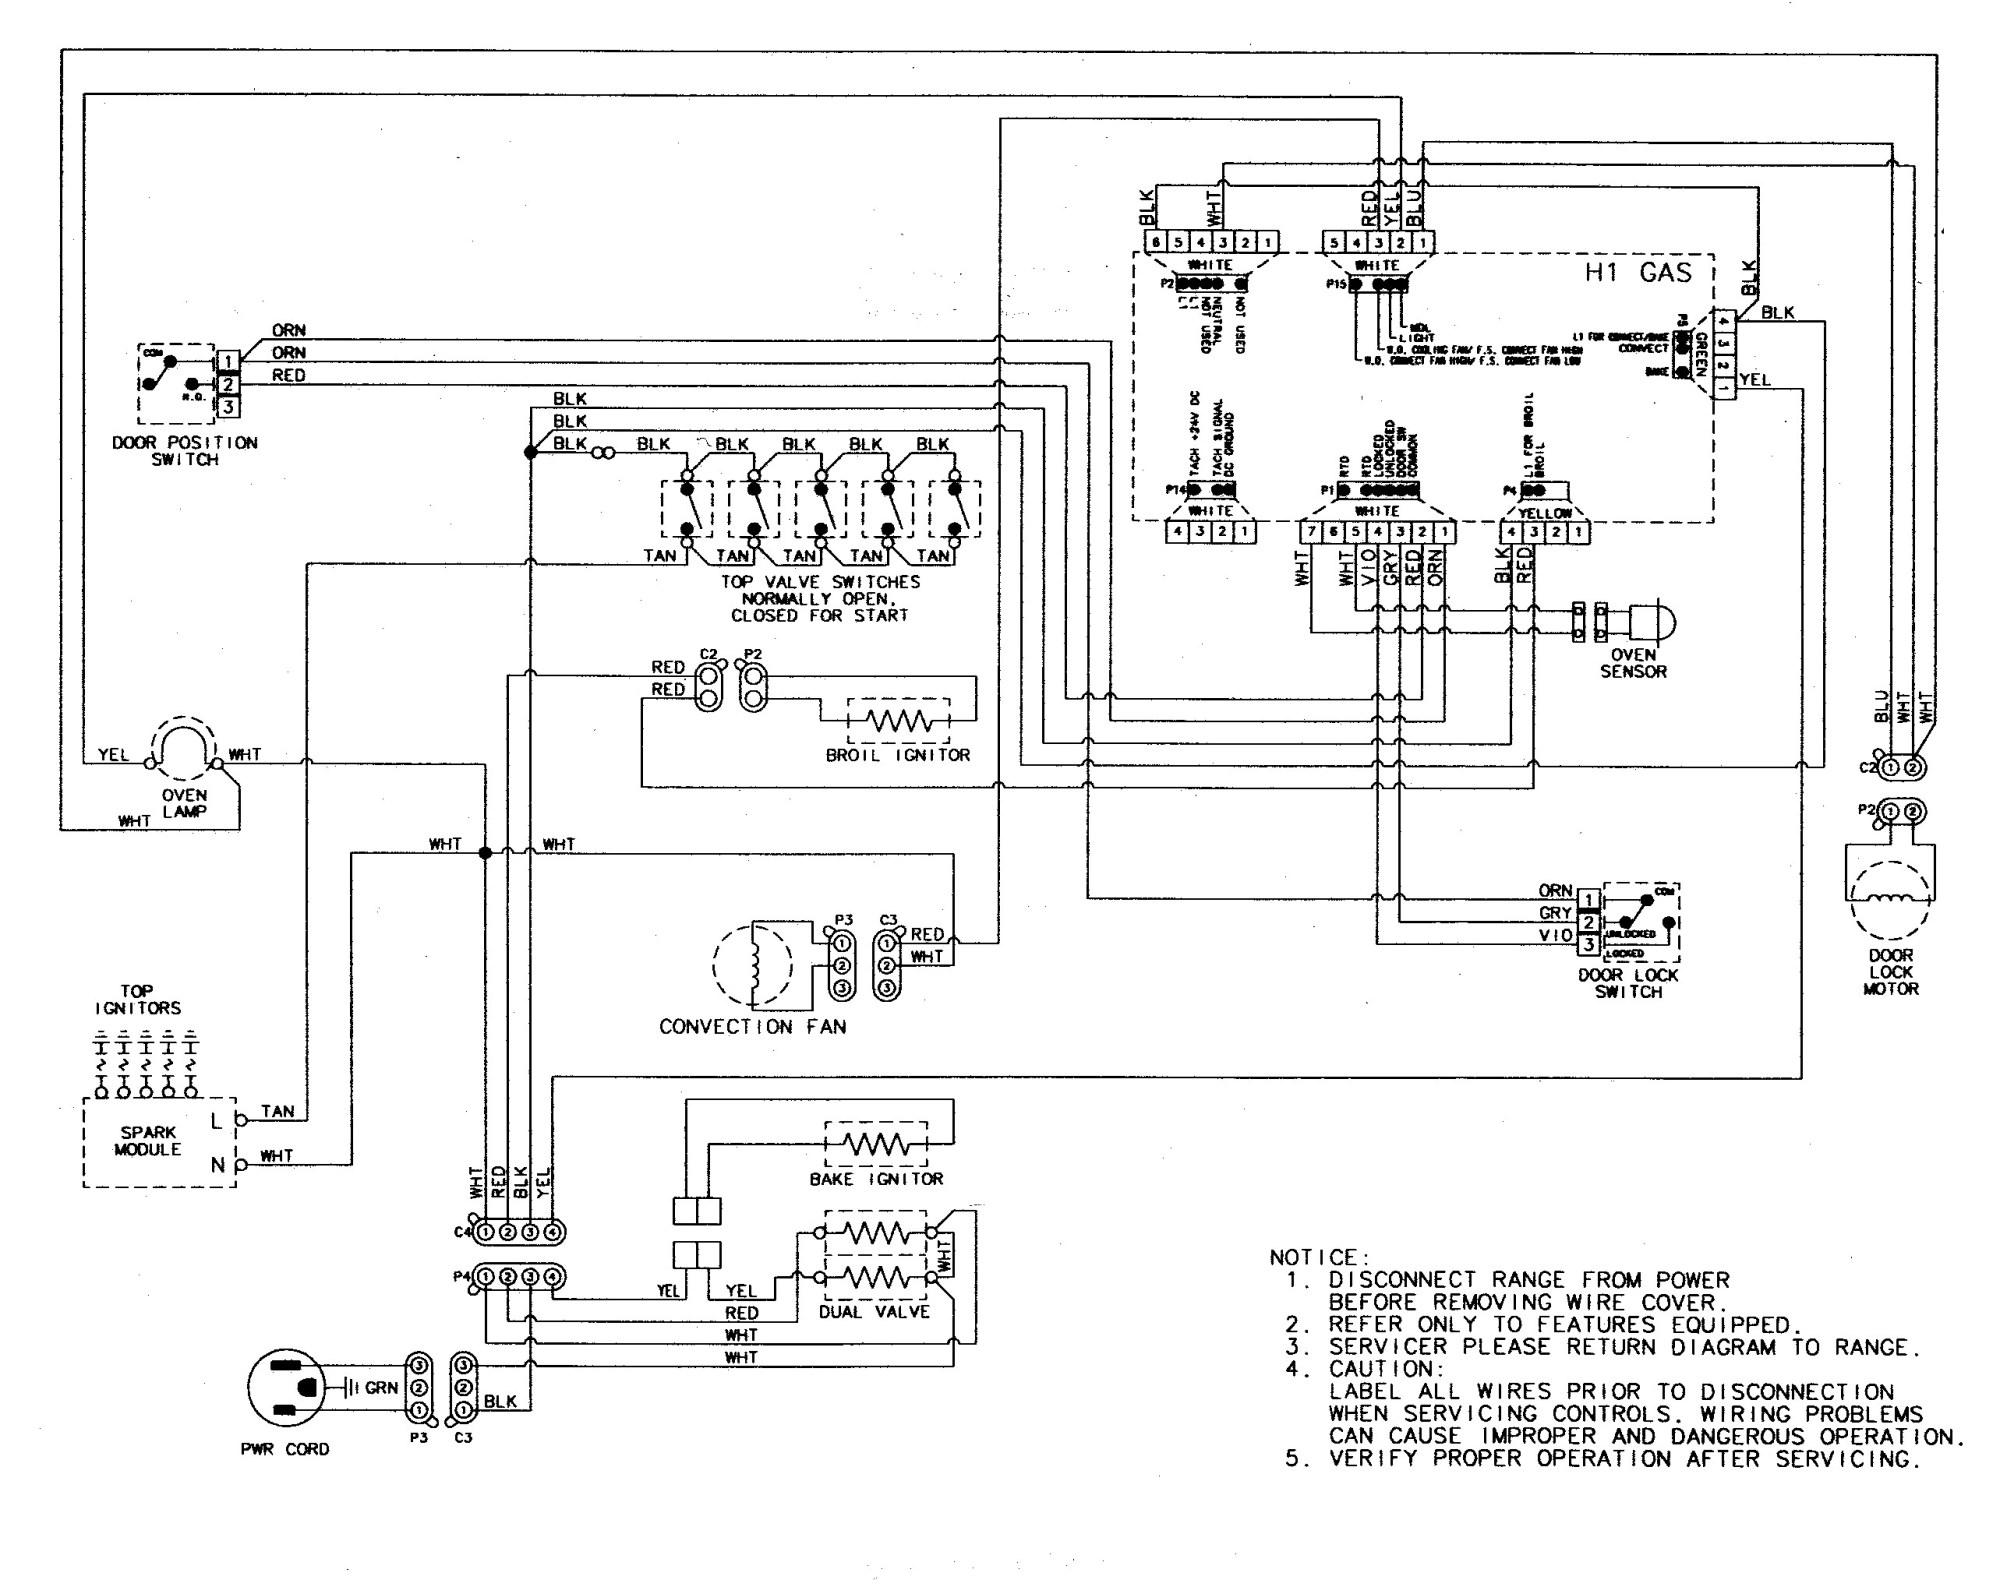 hight resolution of roper oven wiring diagram automotive wiring diagram u2022 rh nfluencer co gt 14 wheel horse wiring